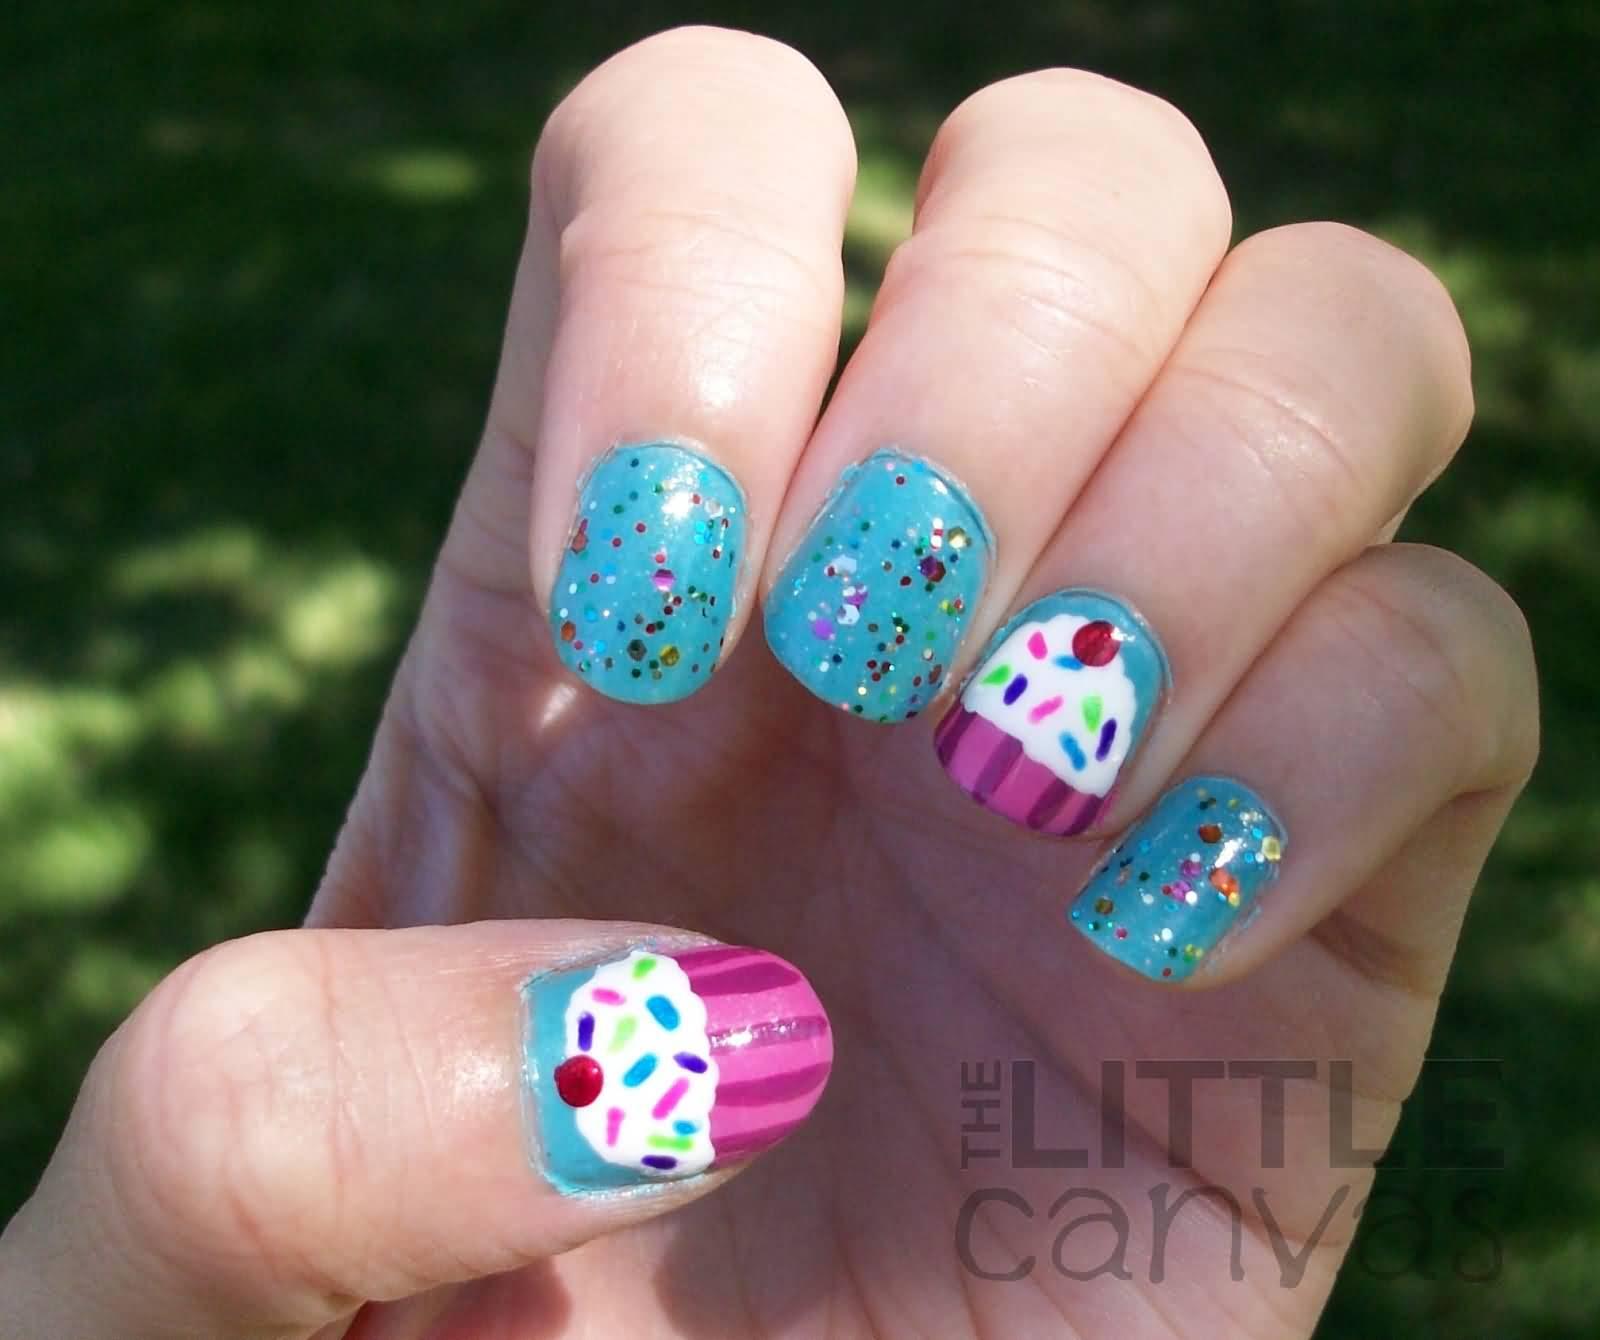 Birthday Nail Designs: 30+ Most Adorable Birthday Nail Art Designs